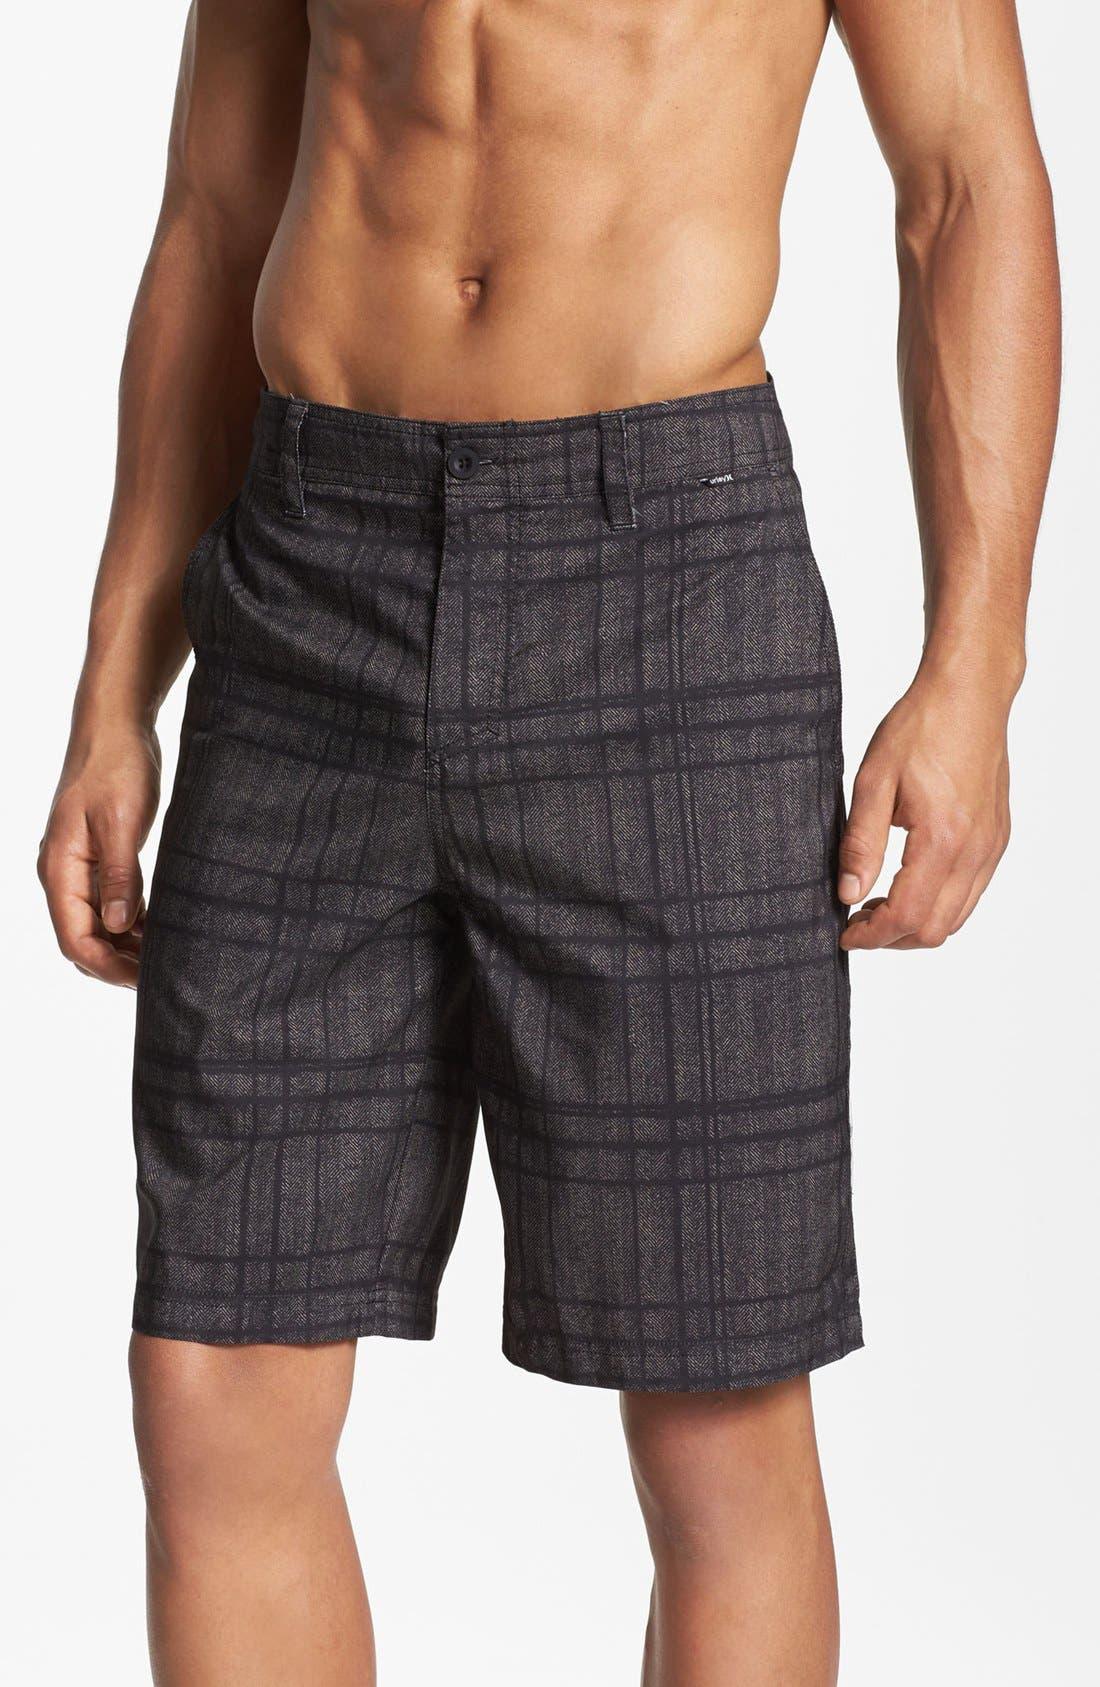 Alternate Image 1 Selected - Hurley 'Marina Intersect' Hybrid Shorts